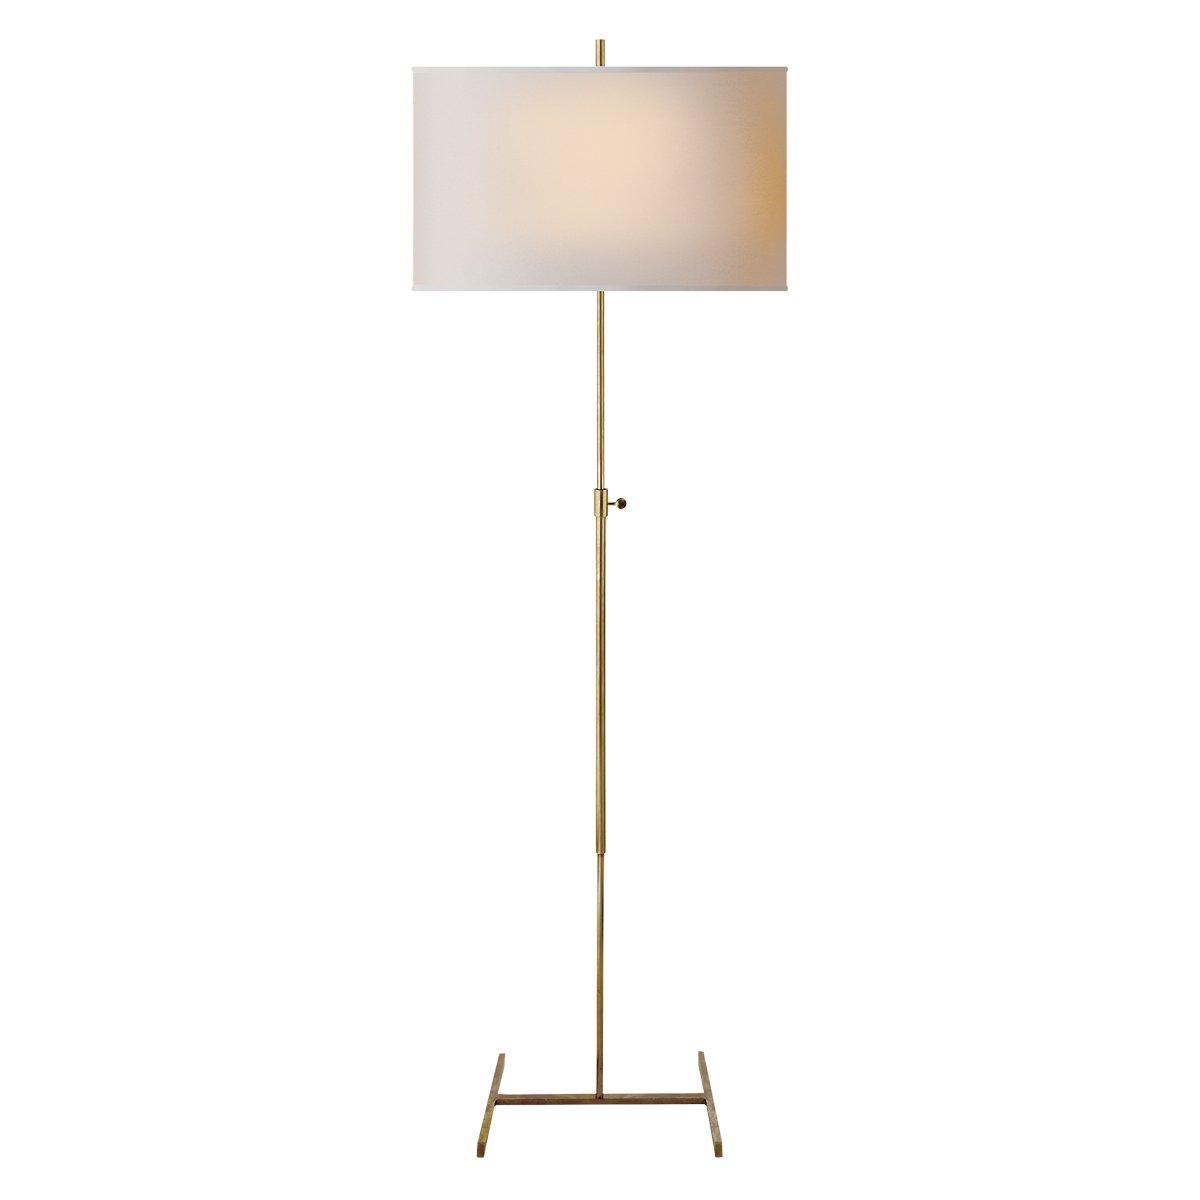 Jake_Adjustable_Floor_Lamp_3 (1).jpg